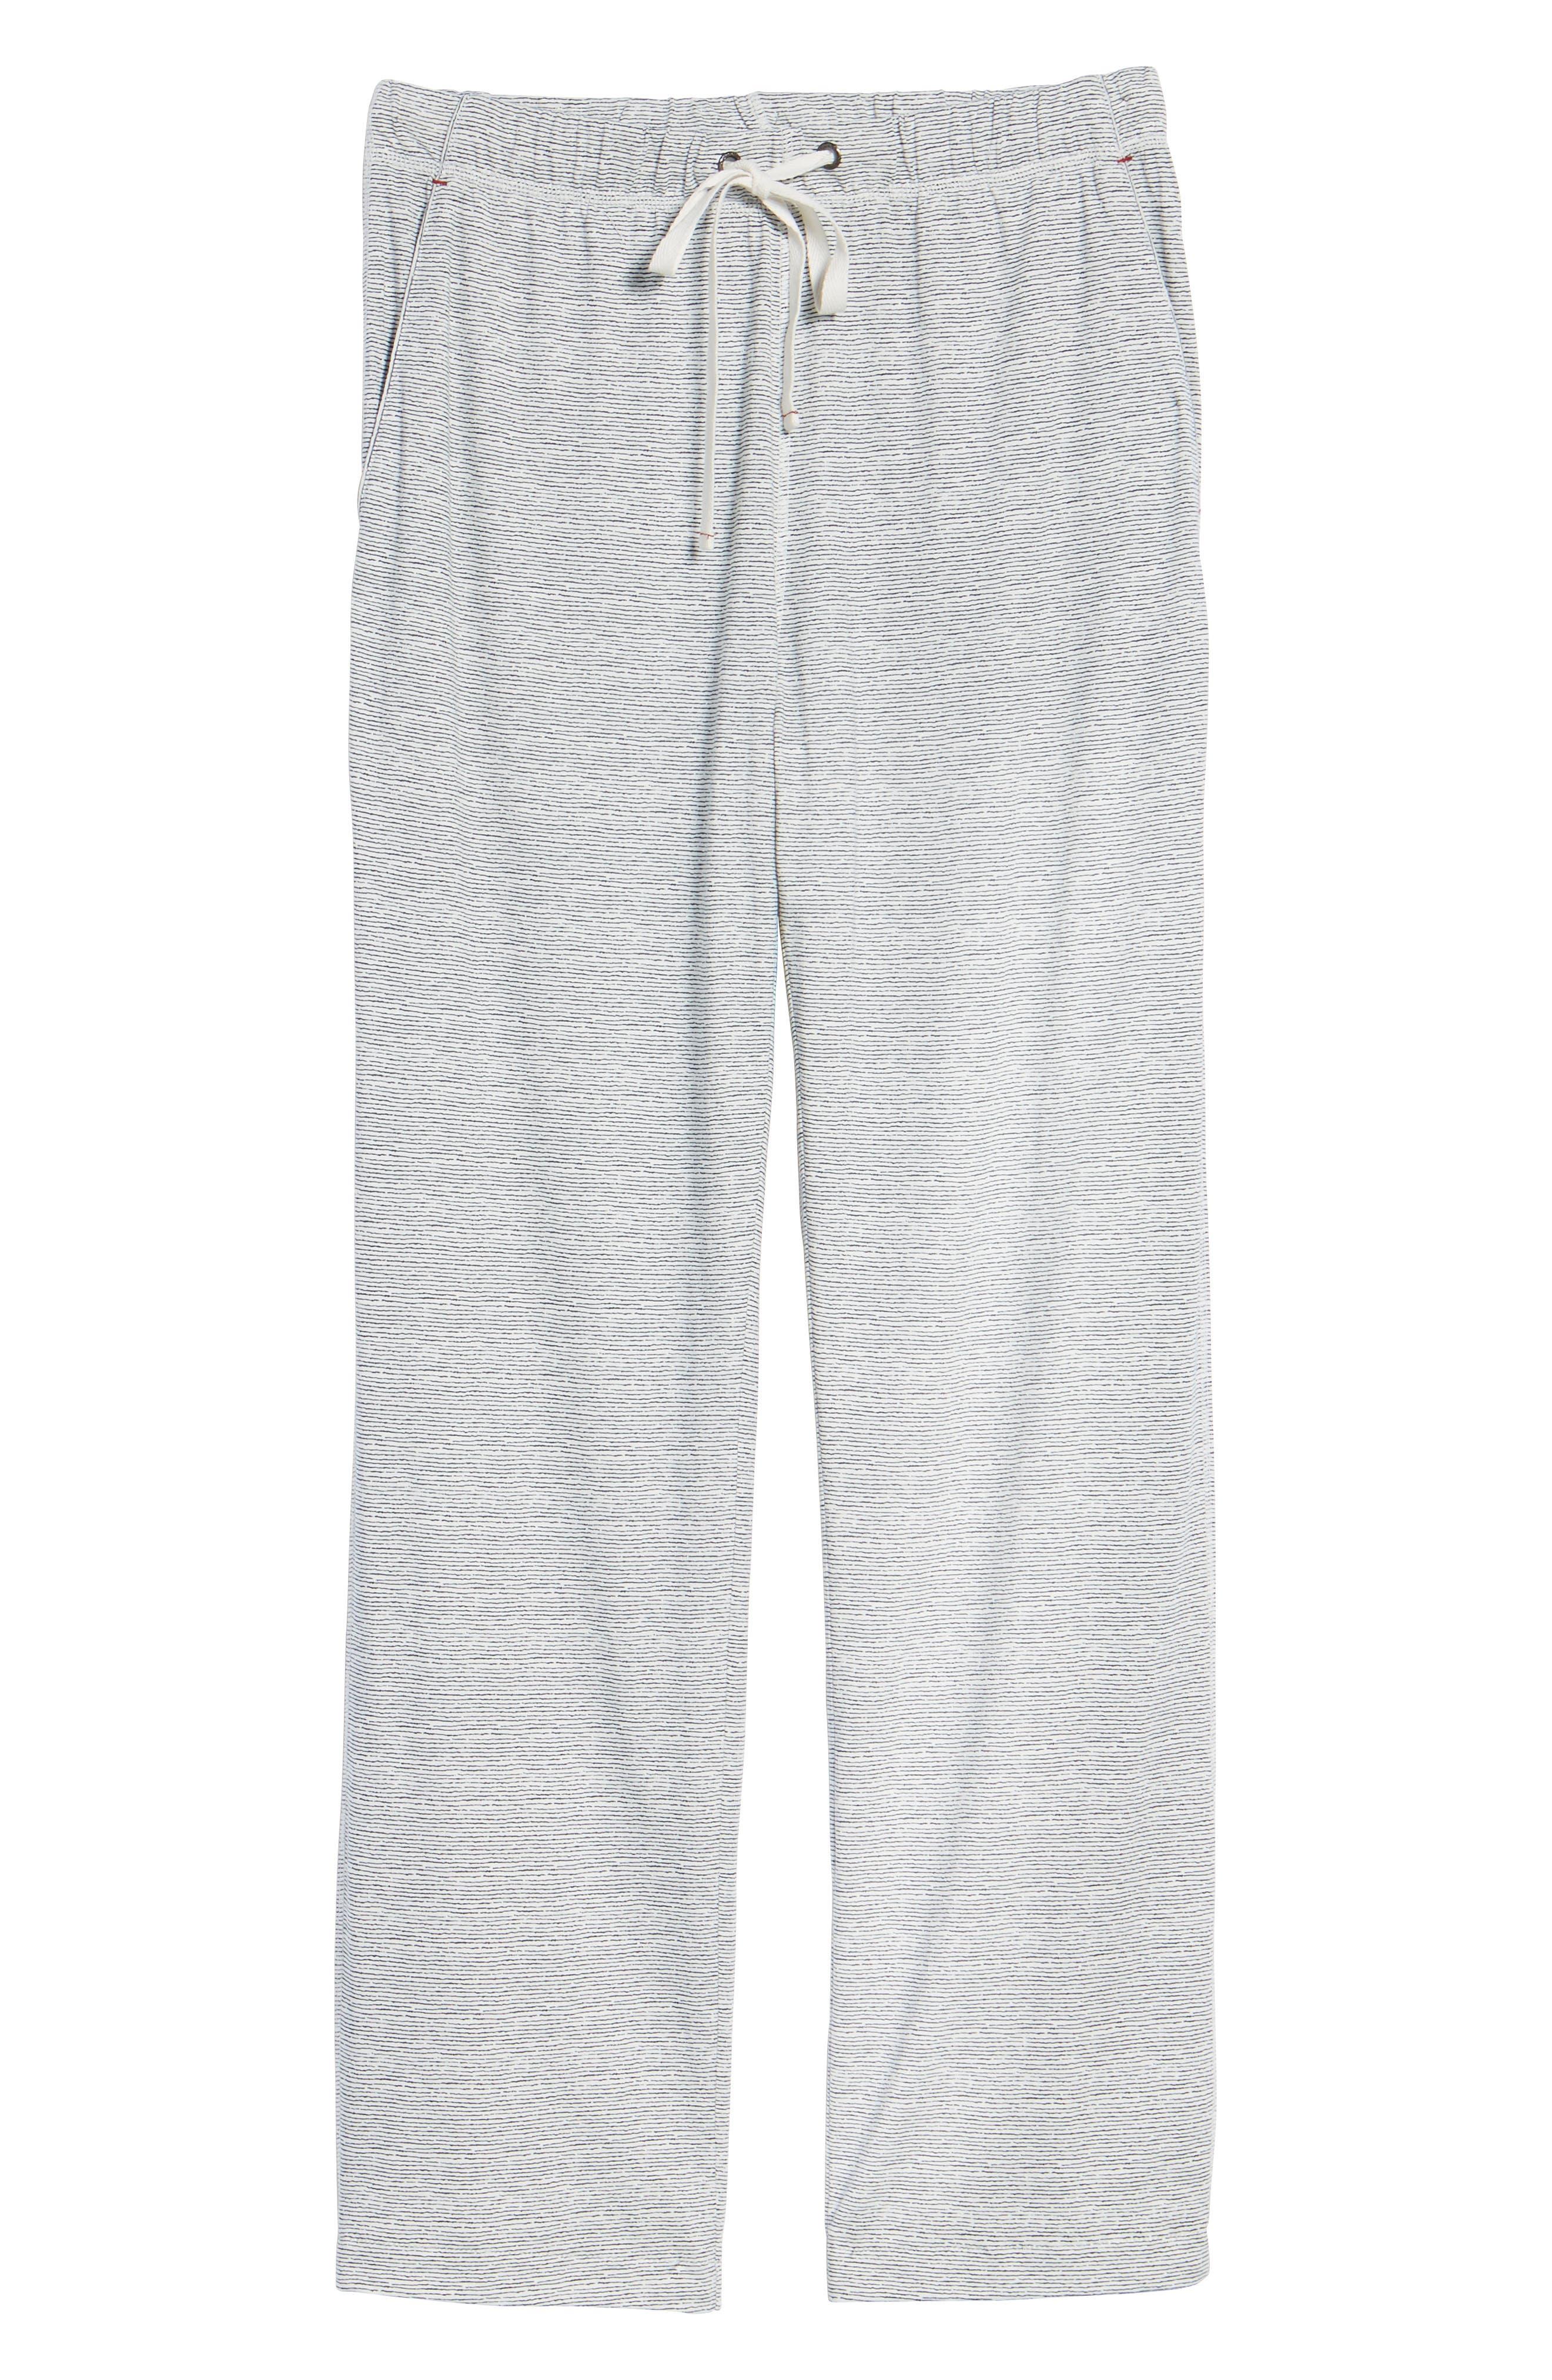 Pima Cotton & Modal Lounge Pants,                             Alternate thumbnail 6, color,                             Blue